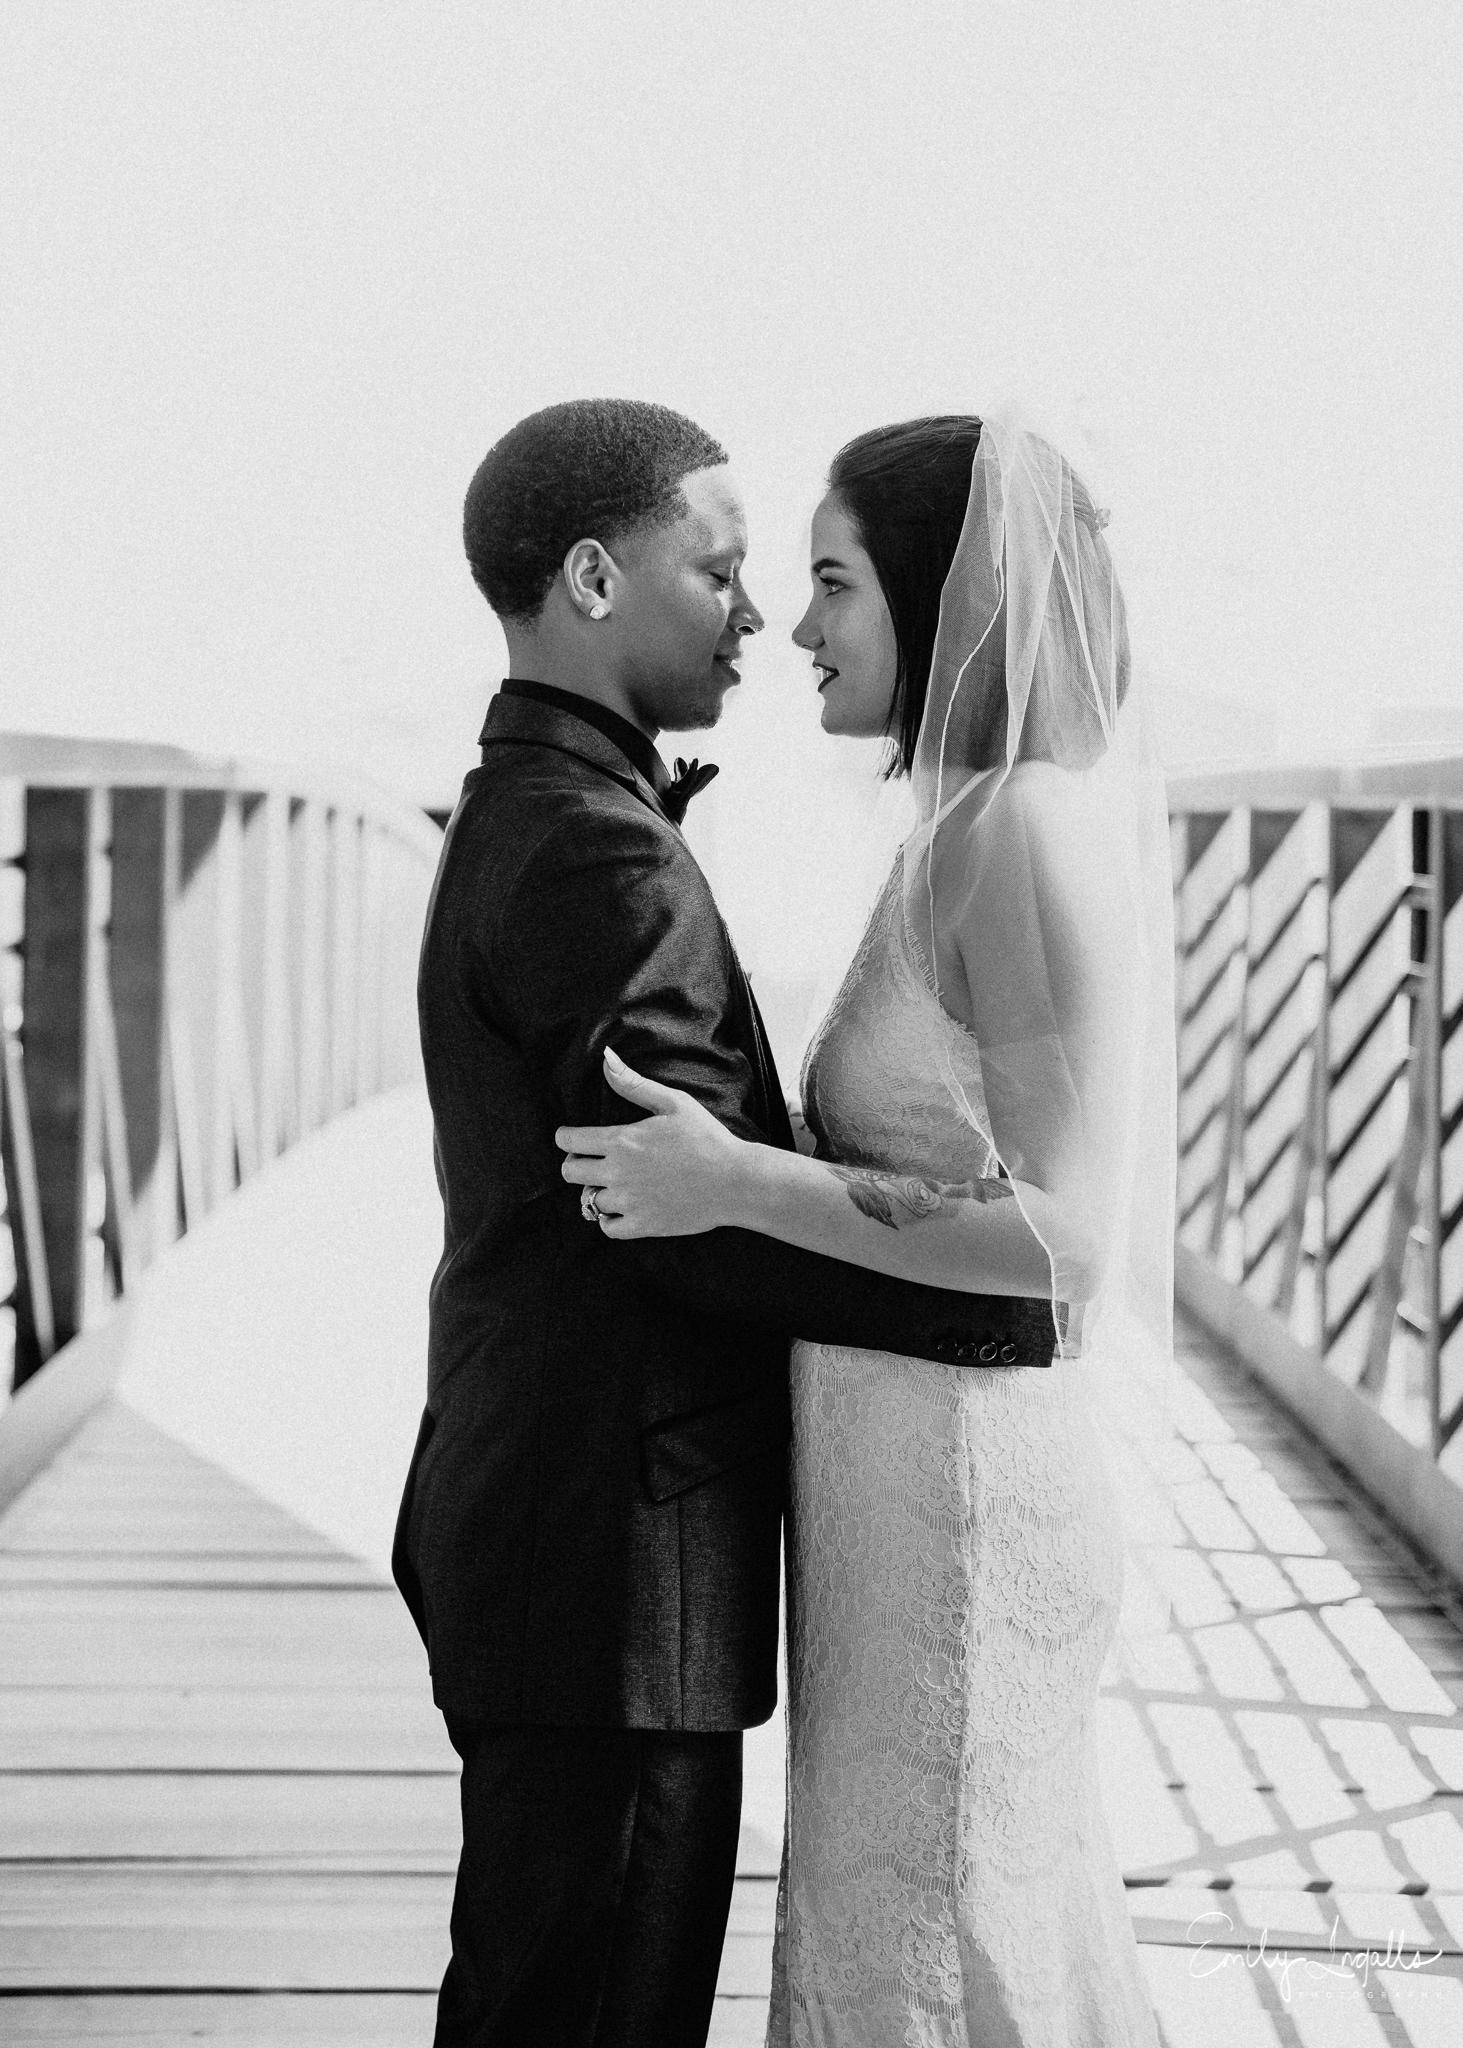 Wedding Photographer_Round Rock Wedding Photographer_Emily Ingalls Photography_Austin Photographer_Pflugerville Wedding Photographer_Georgetown Photographer-13.jpg